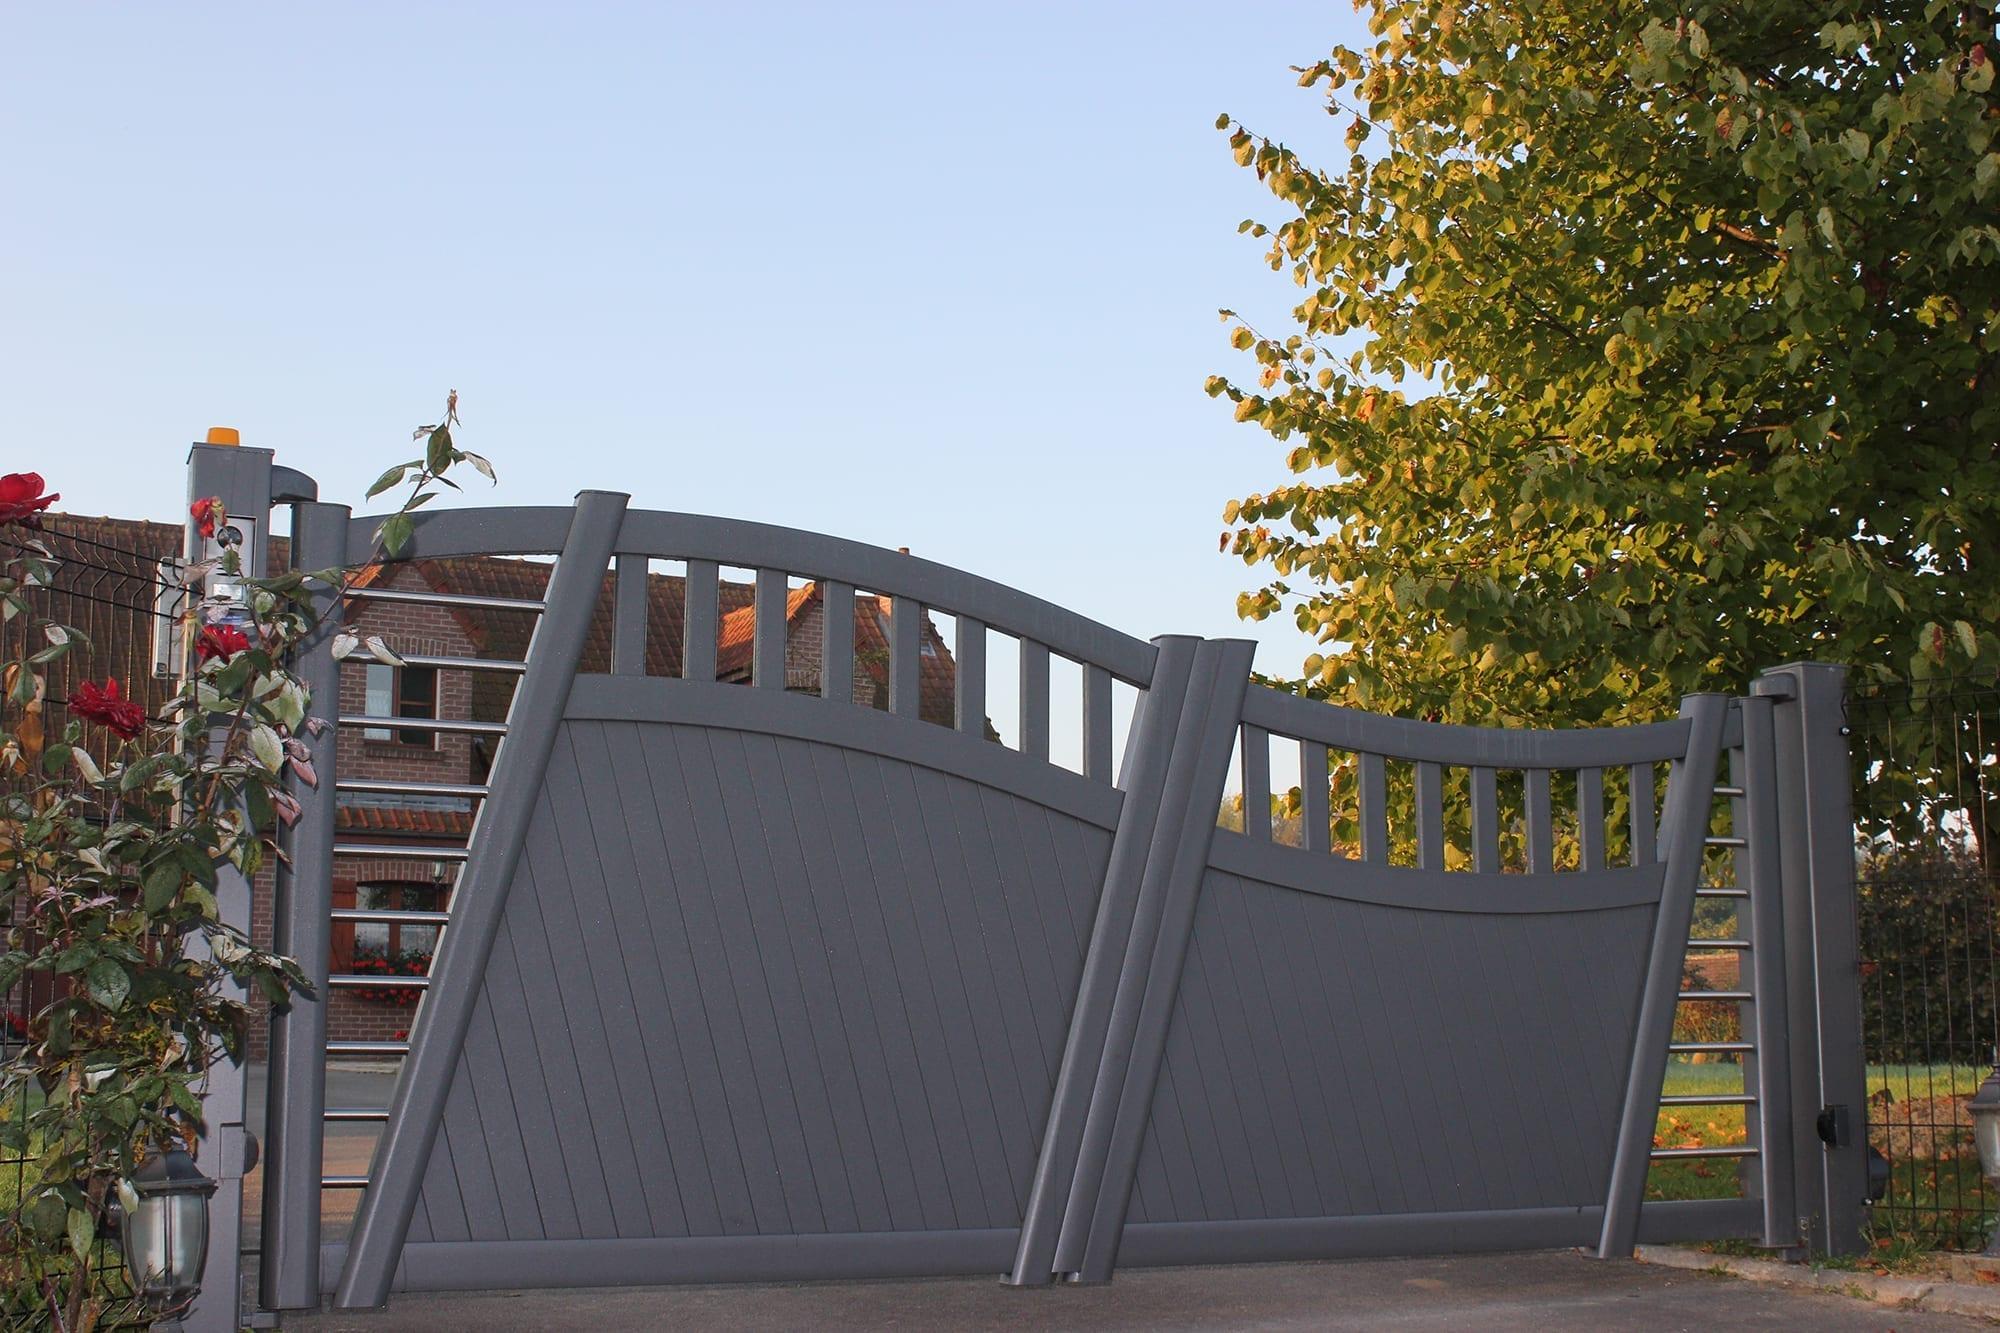 k materra scala tore und z une aus aluminium k mmerling. Black Bedroom Furniture Sets. Home Design Ideas